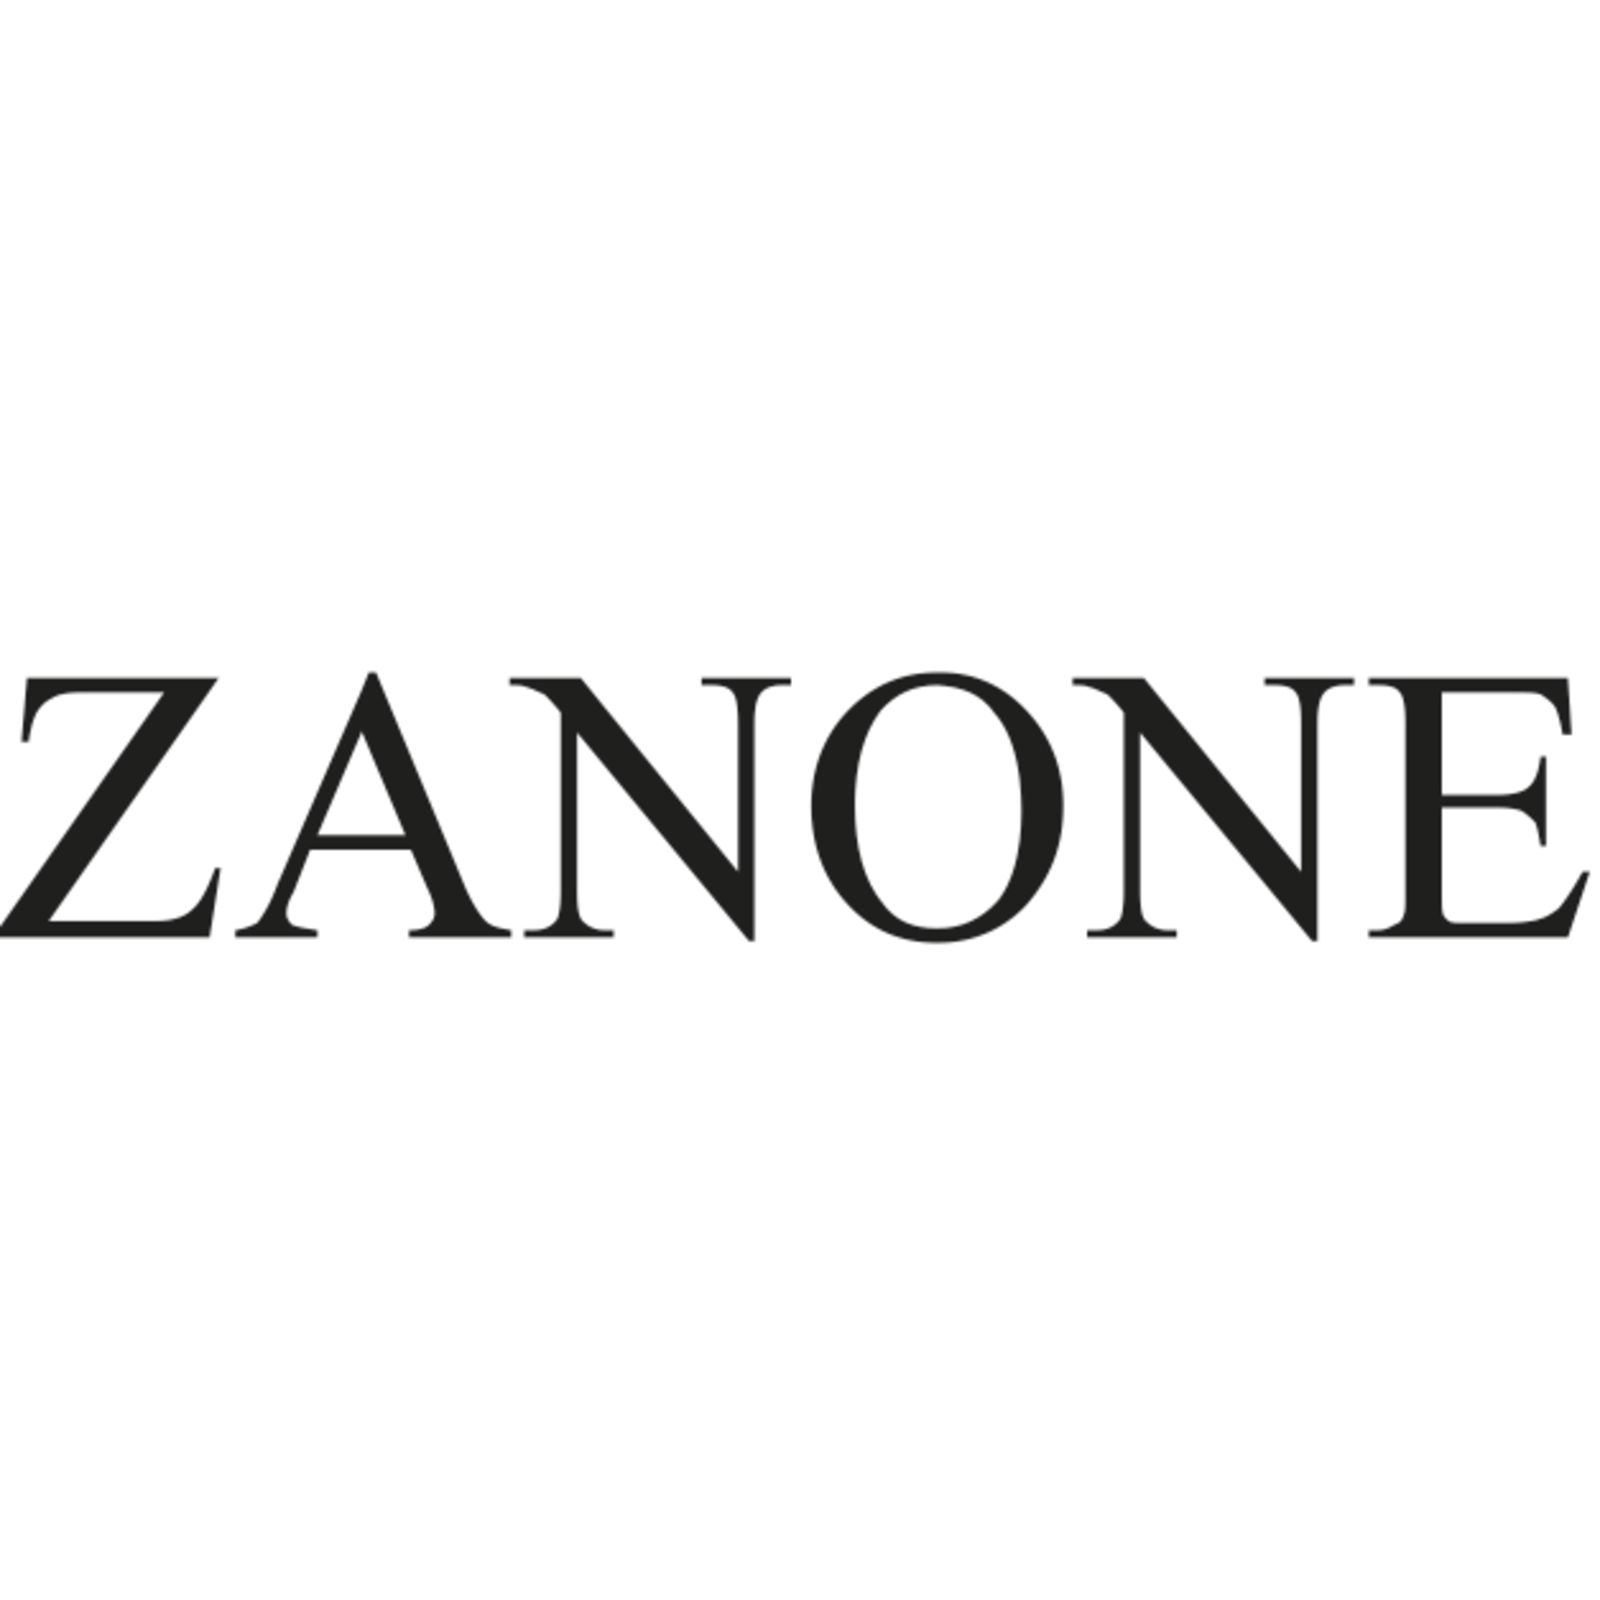 ZANONE (Image 1)